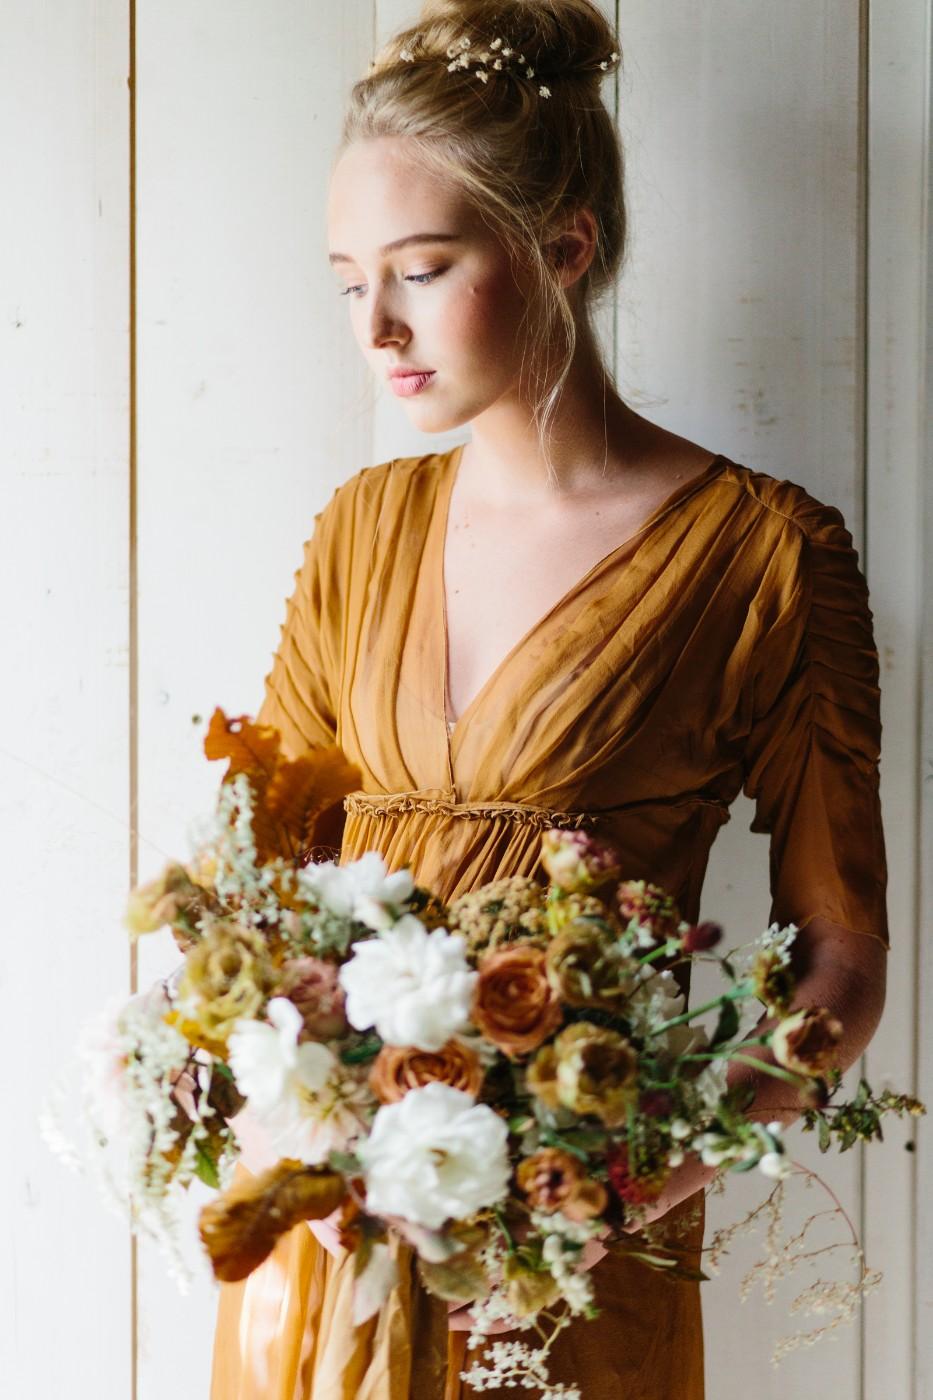 Photography by Kate Osborne